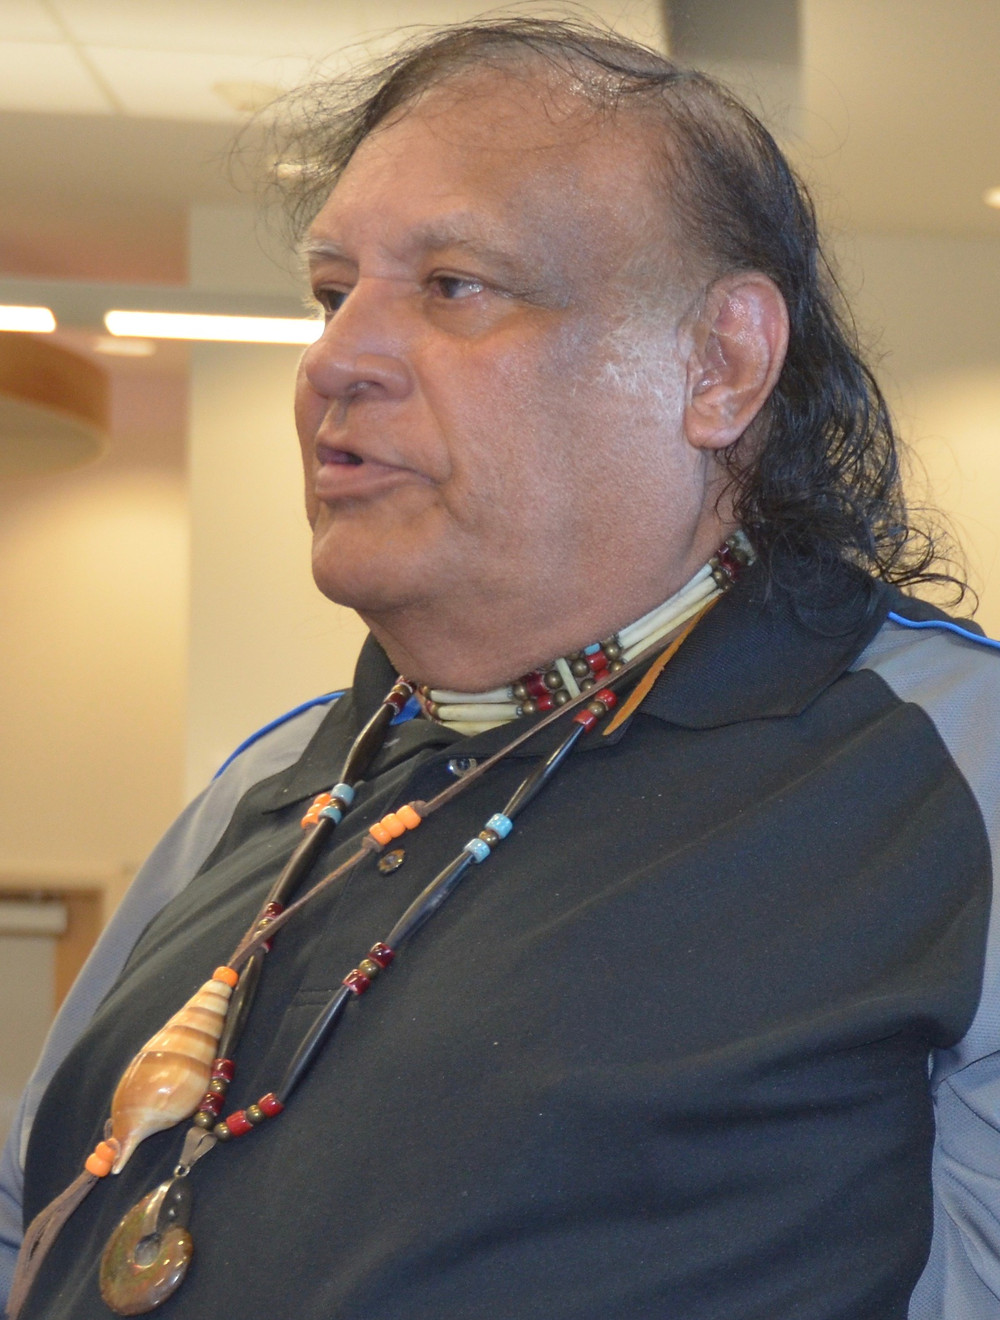 Waccamaw Chief Harold Hatcher. Photo by Bob Gatty